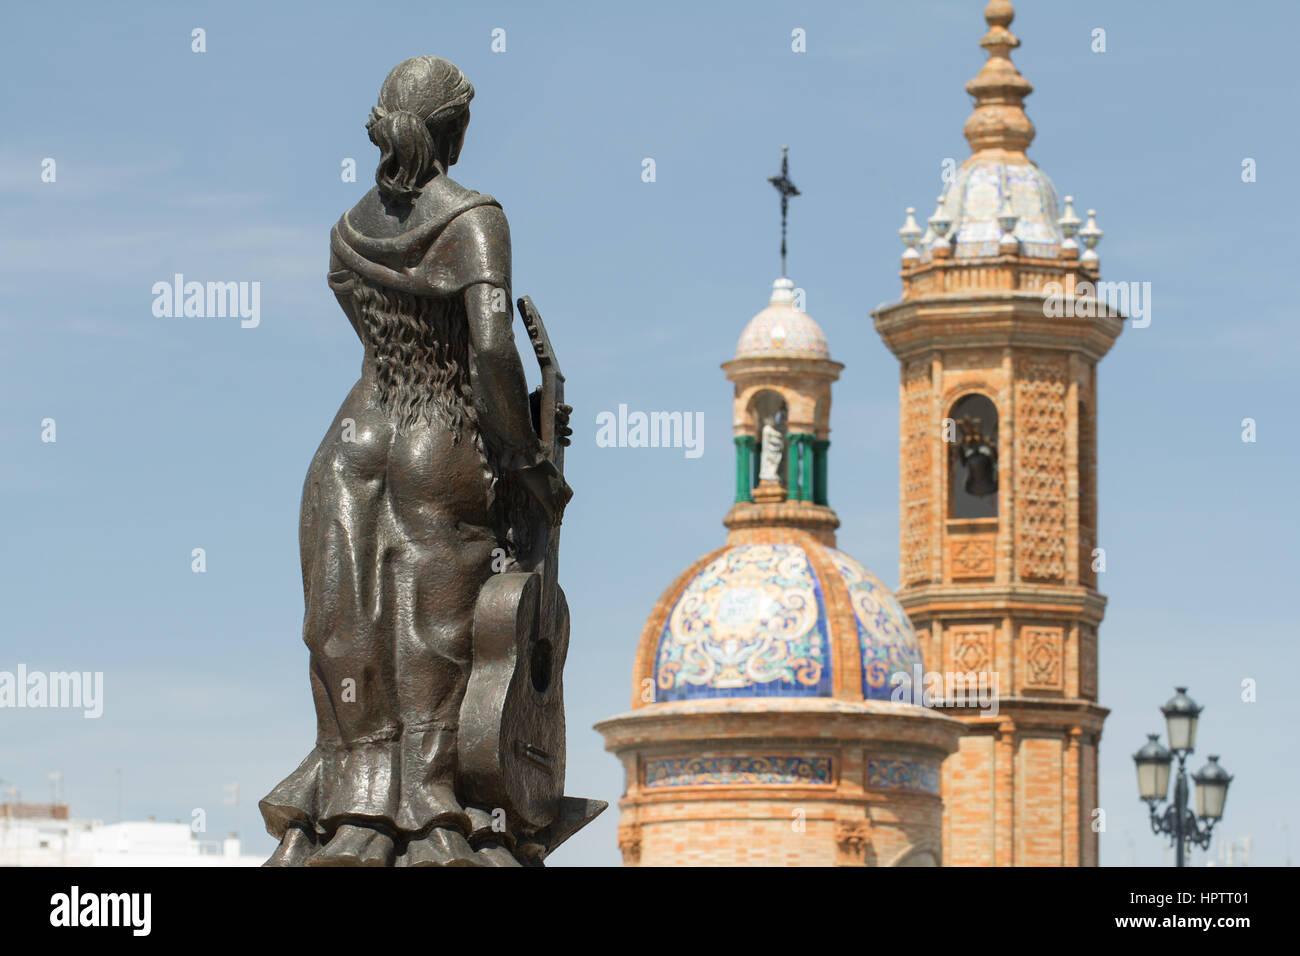 Seville, Spain, April 23 2015: flamenco woman statue in triana Seville. - Stock Image